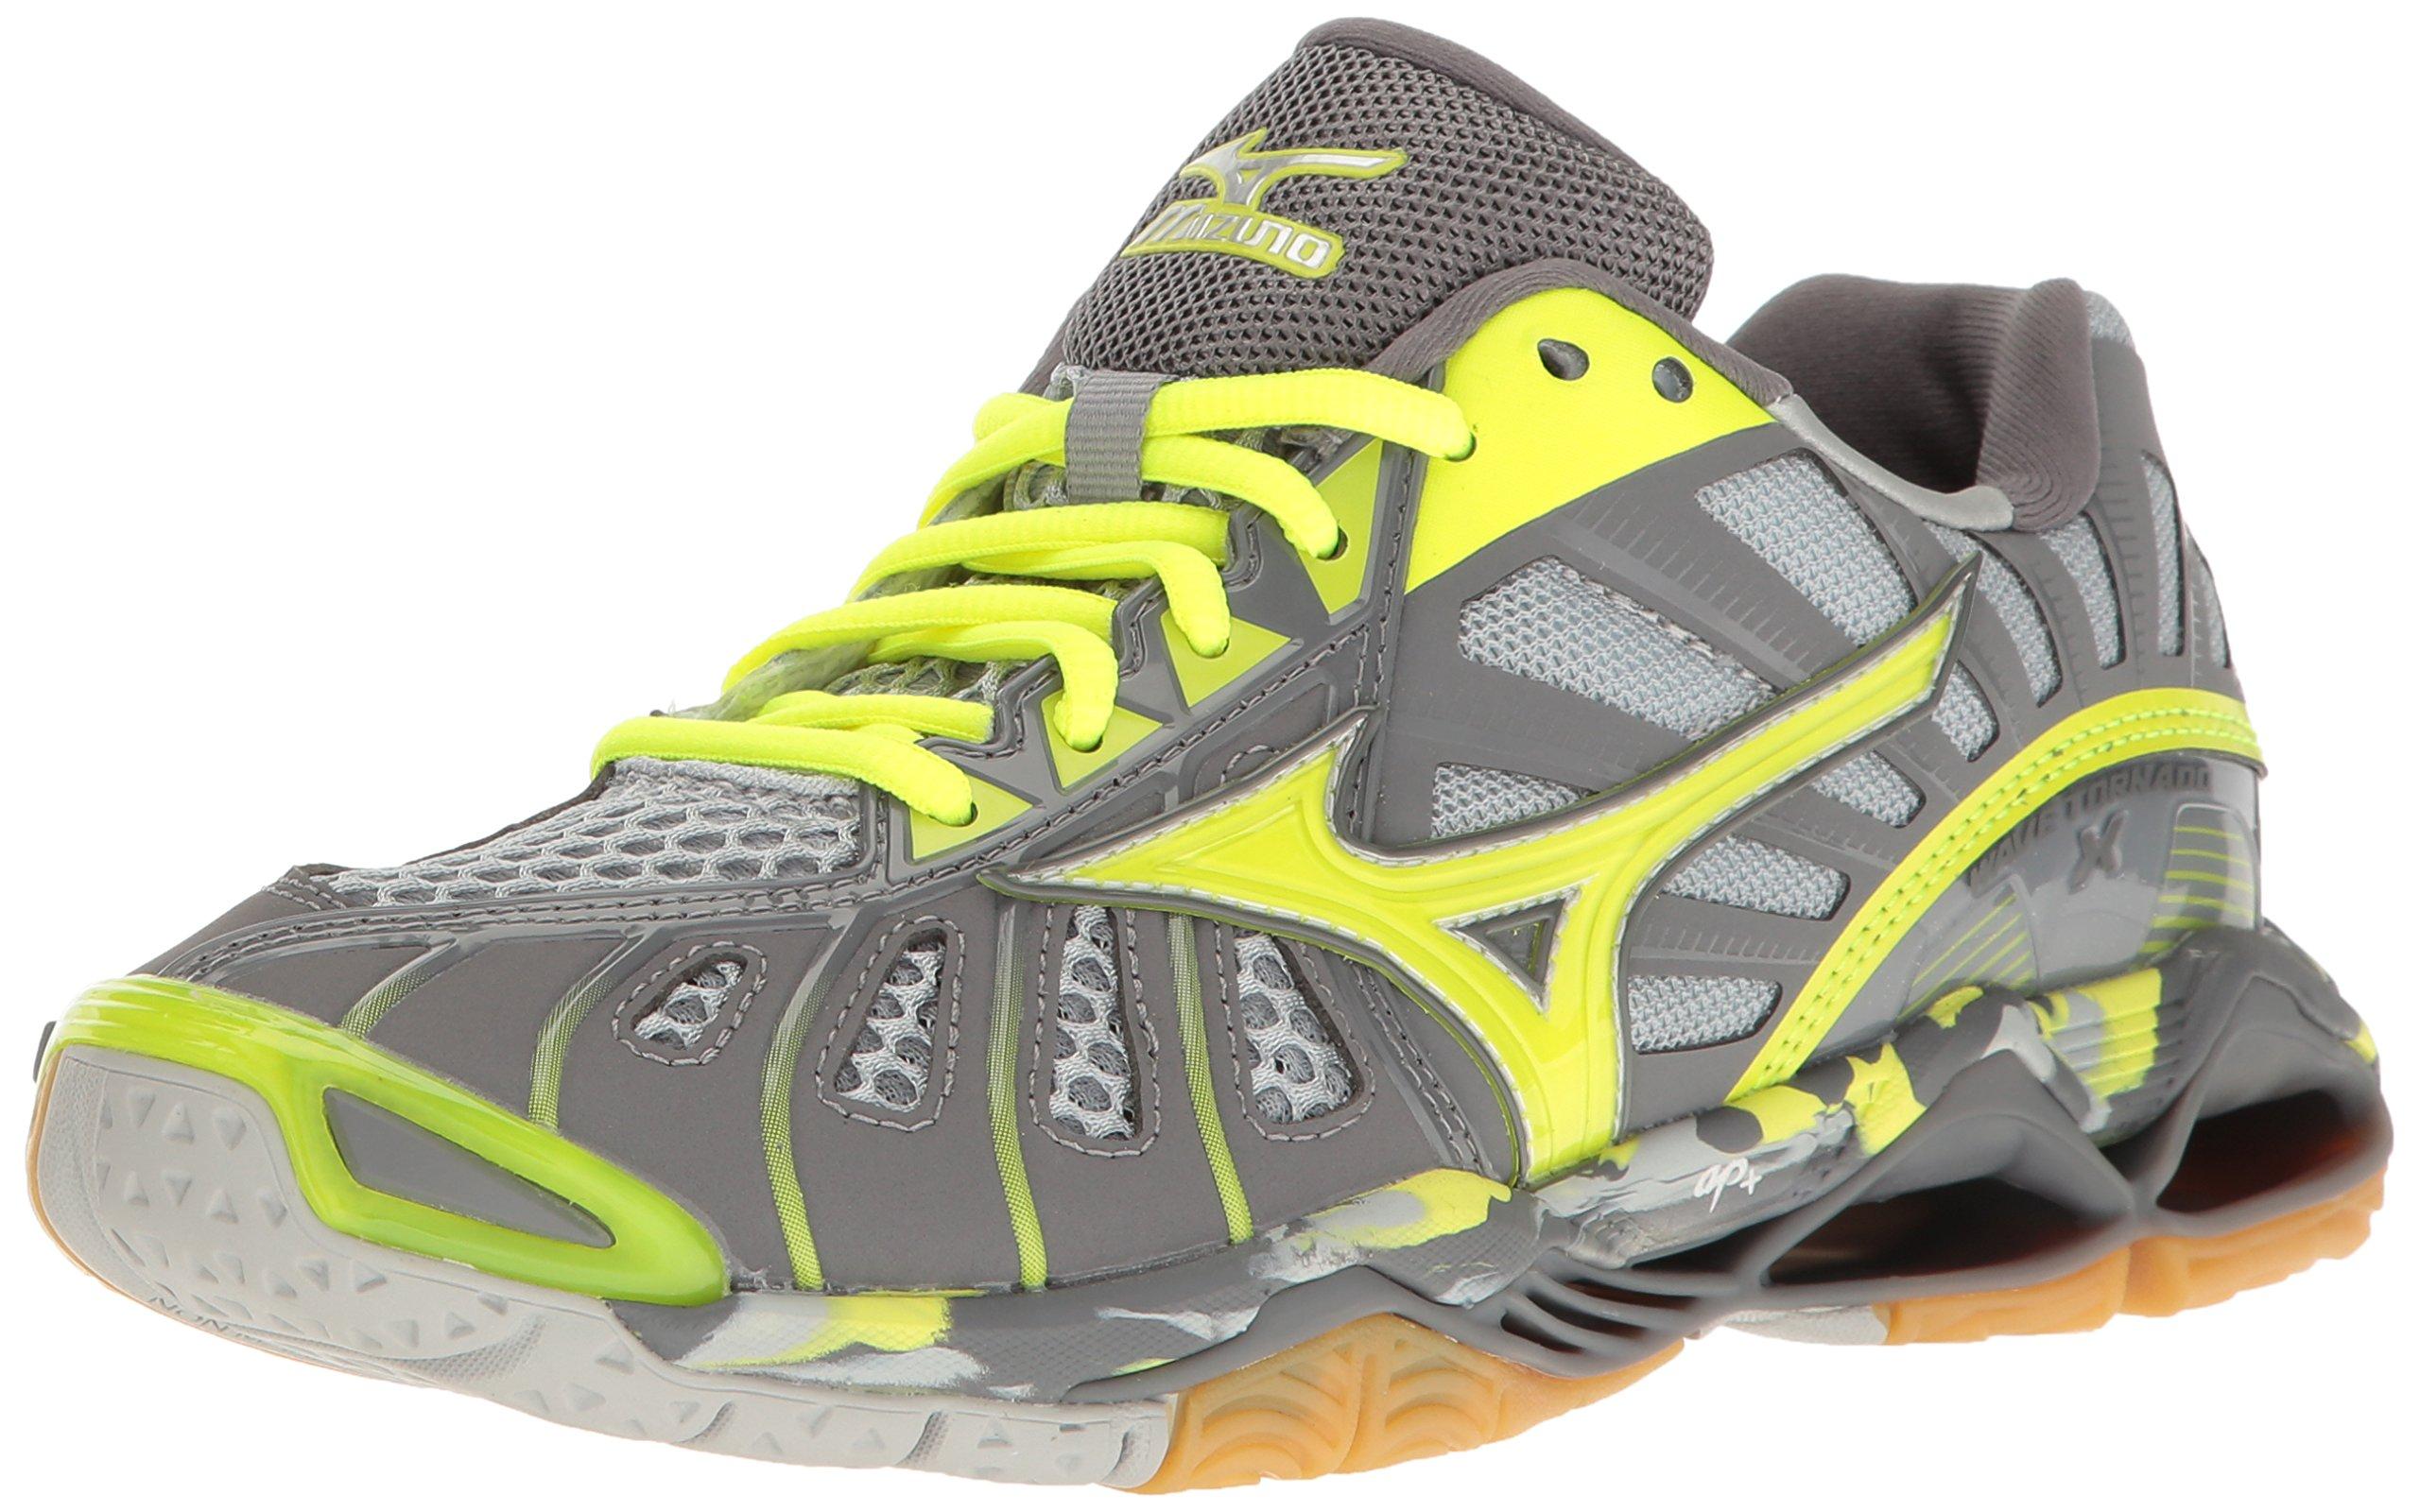 Mizuno Wave Tornado X Womens Volleyball Shoes, Grey/Safety Yellow, 6 B US